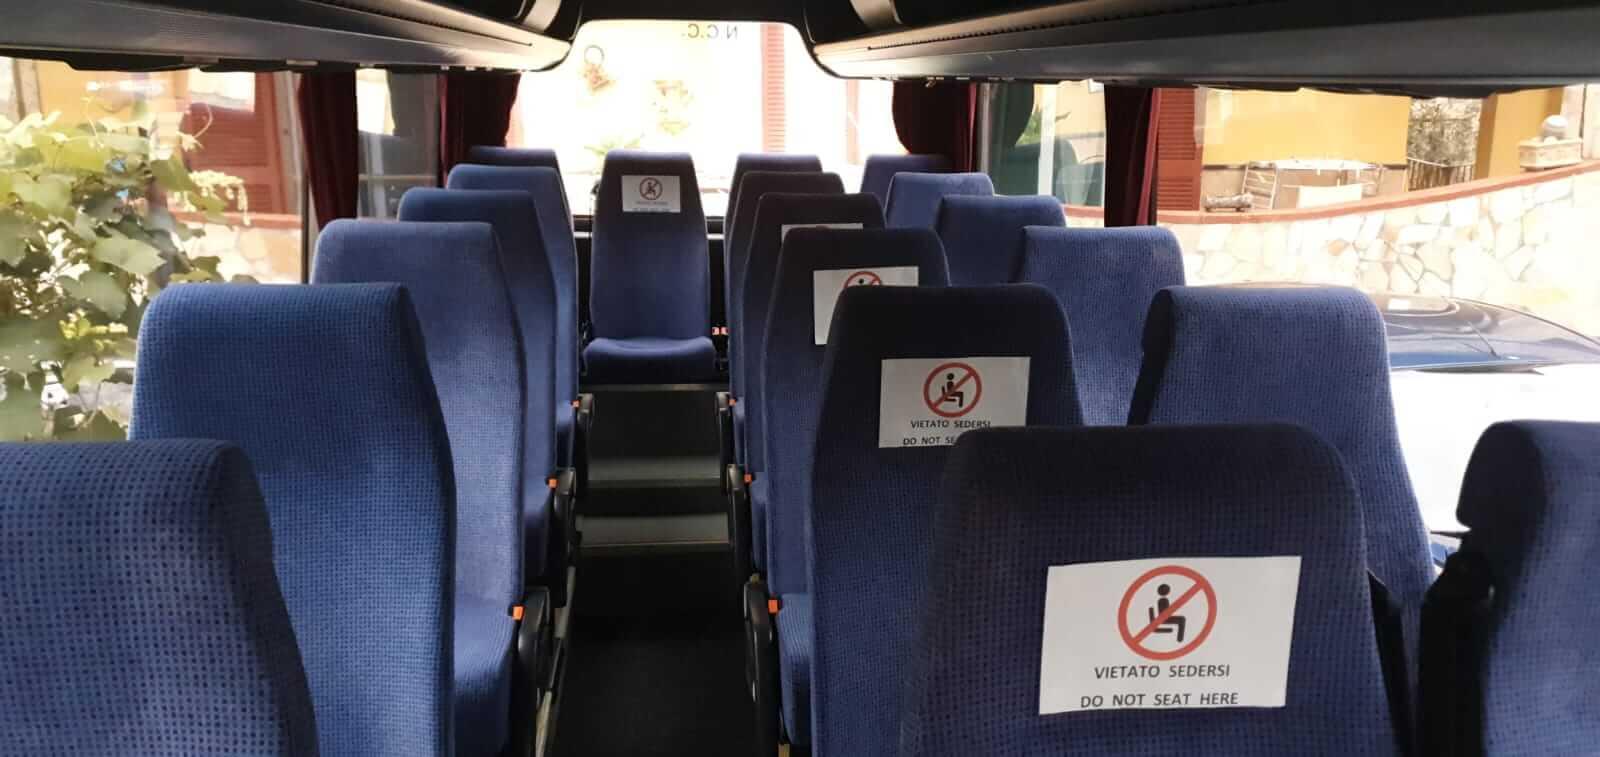 coronaproof vervoer en transport groepen